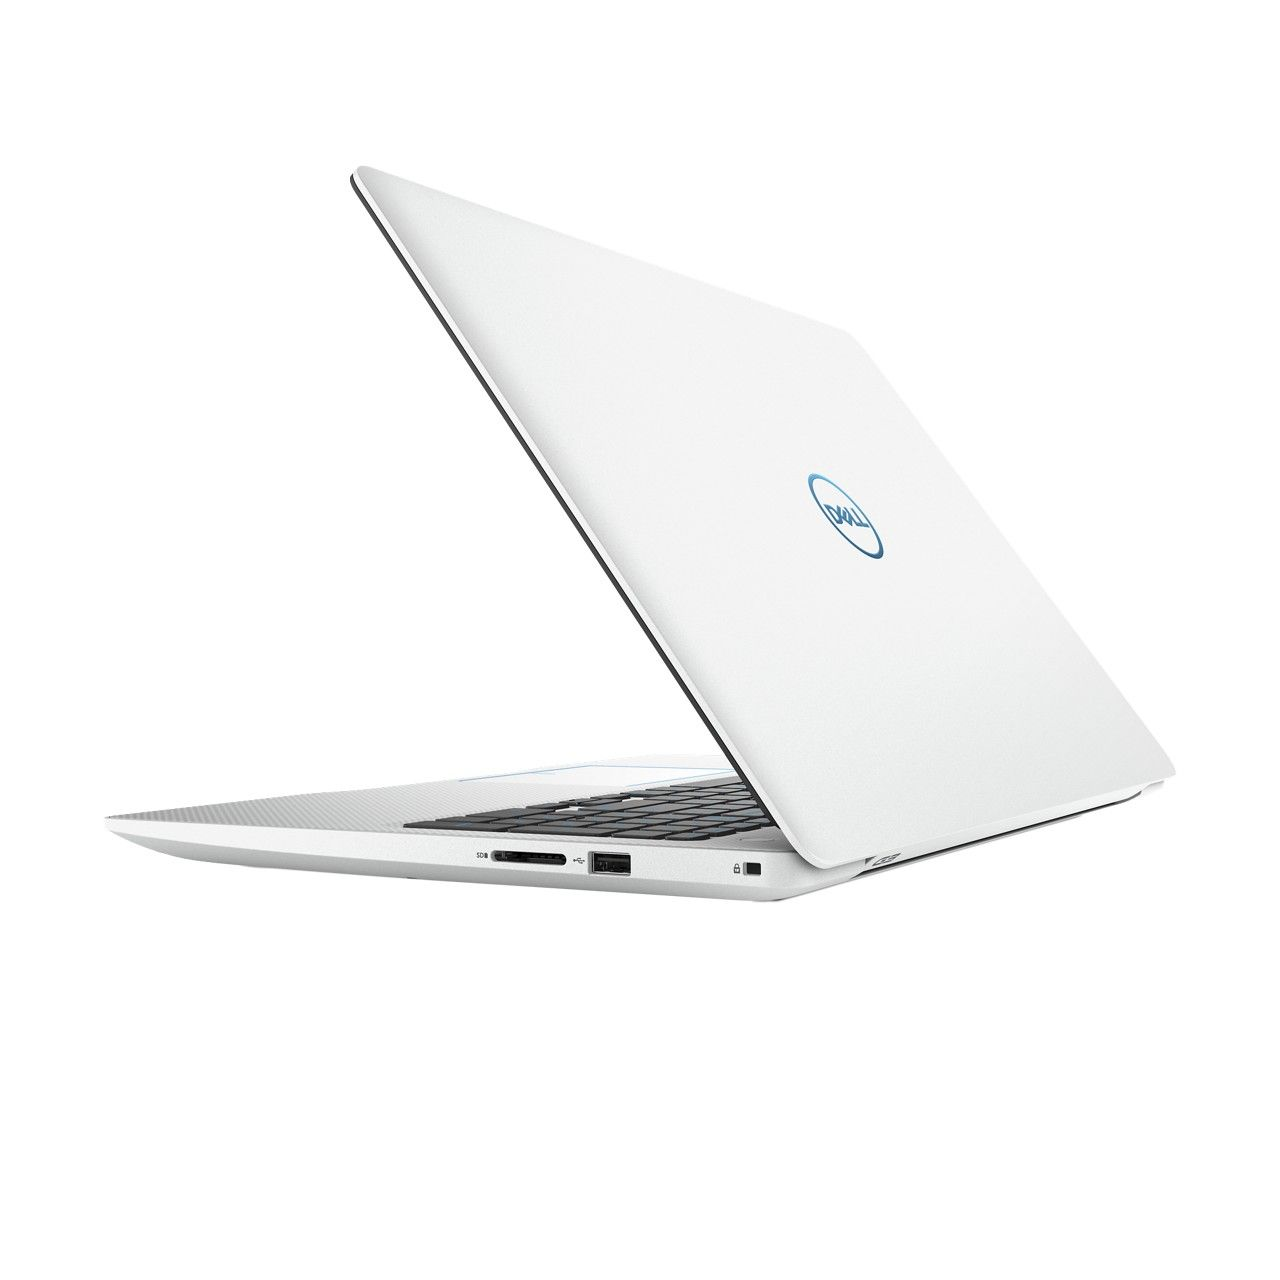 Dell Inspiron G3 3579 15 FHD i7-8750H/16GB/512GB SSD/Ti 1050-4GB/MCR/FPR/HDMI/W10/2RNBD/Bílý